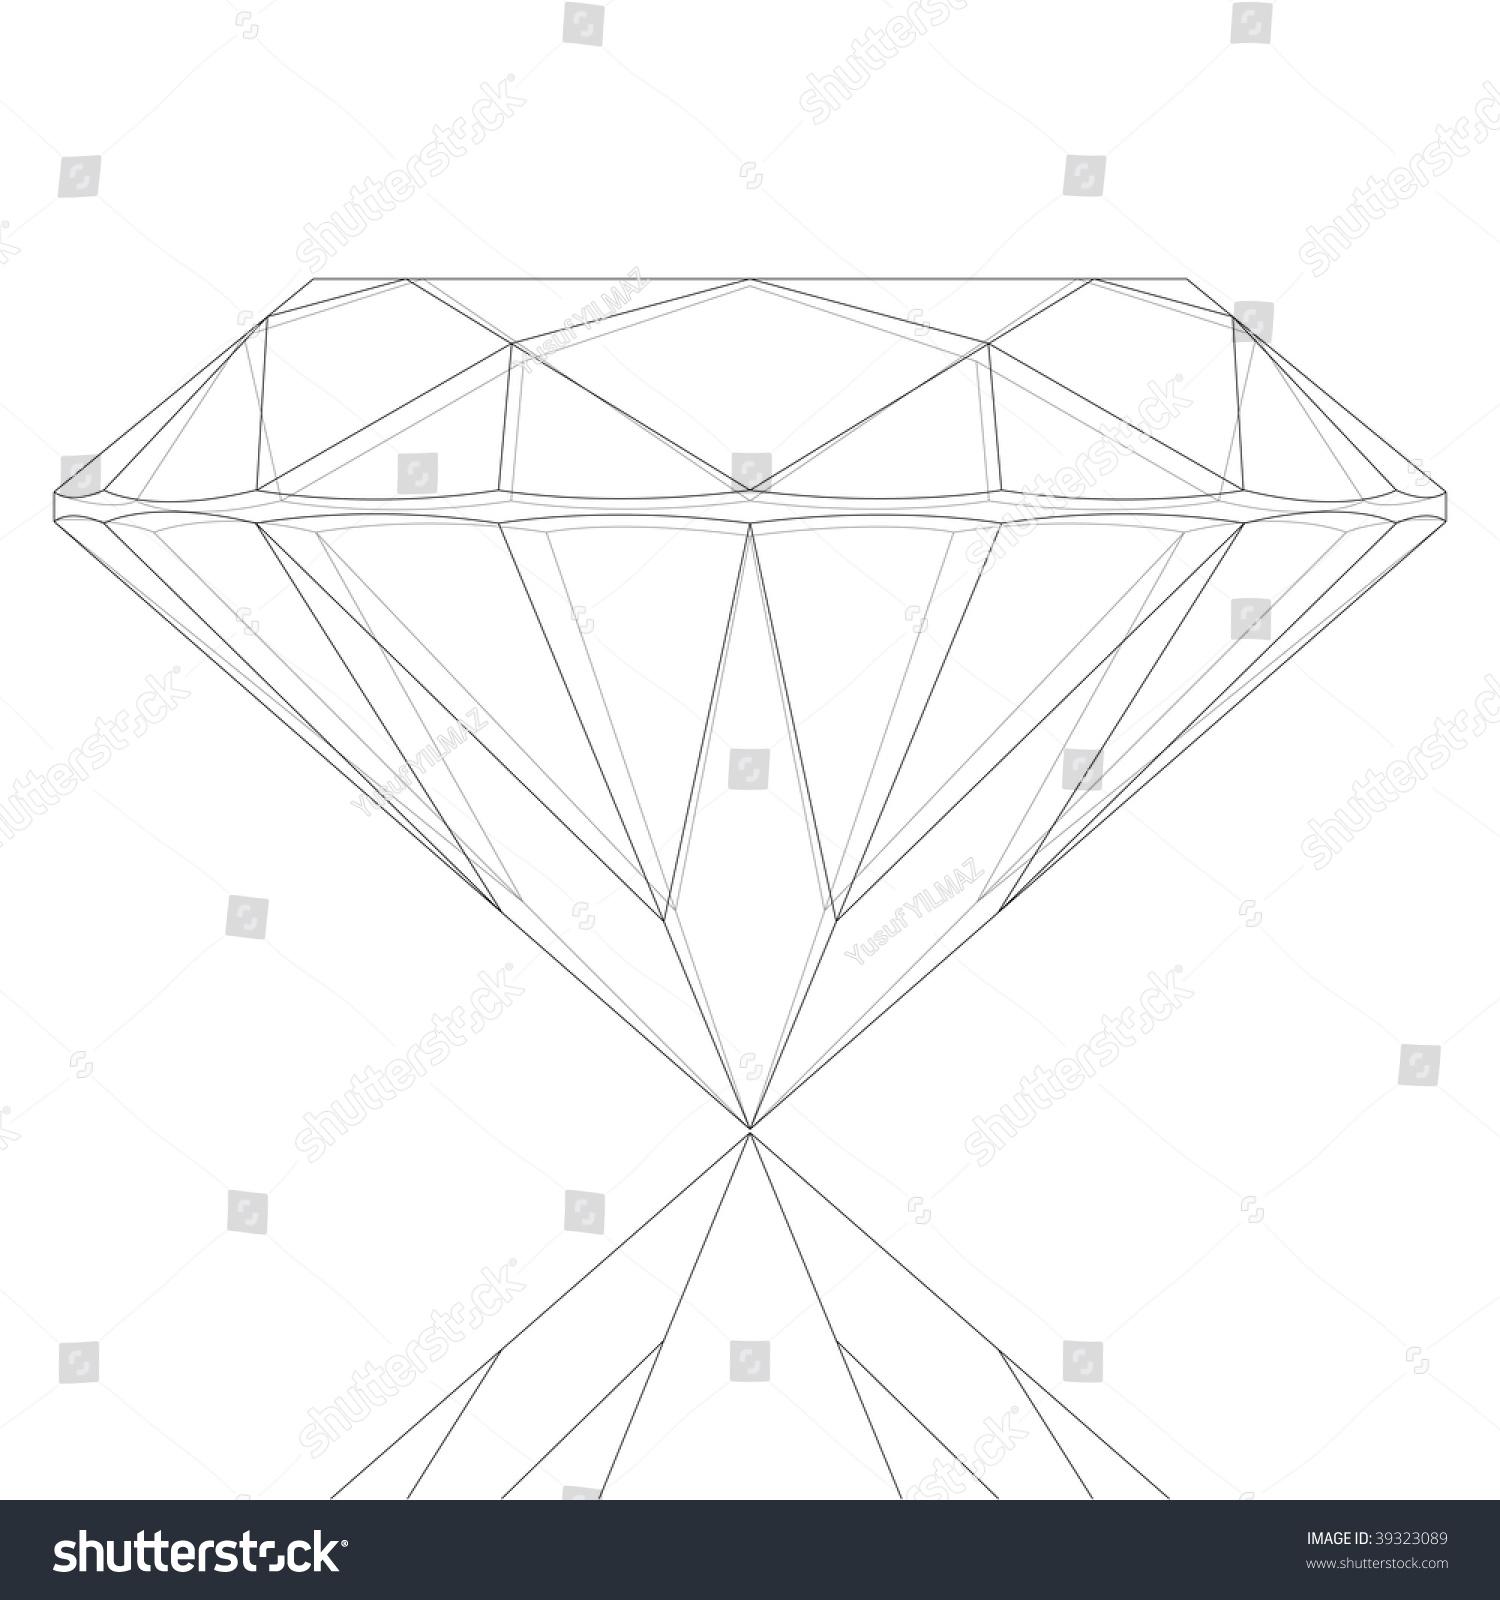 Line Art Diamond : Diamond key line drawing stock vector shutterstock